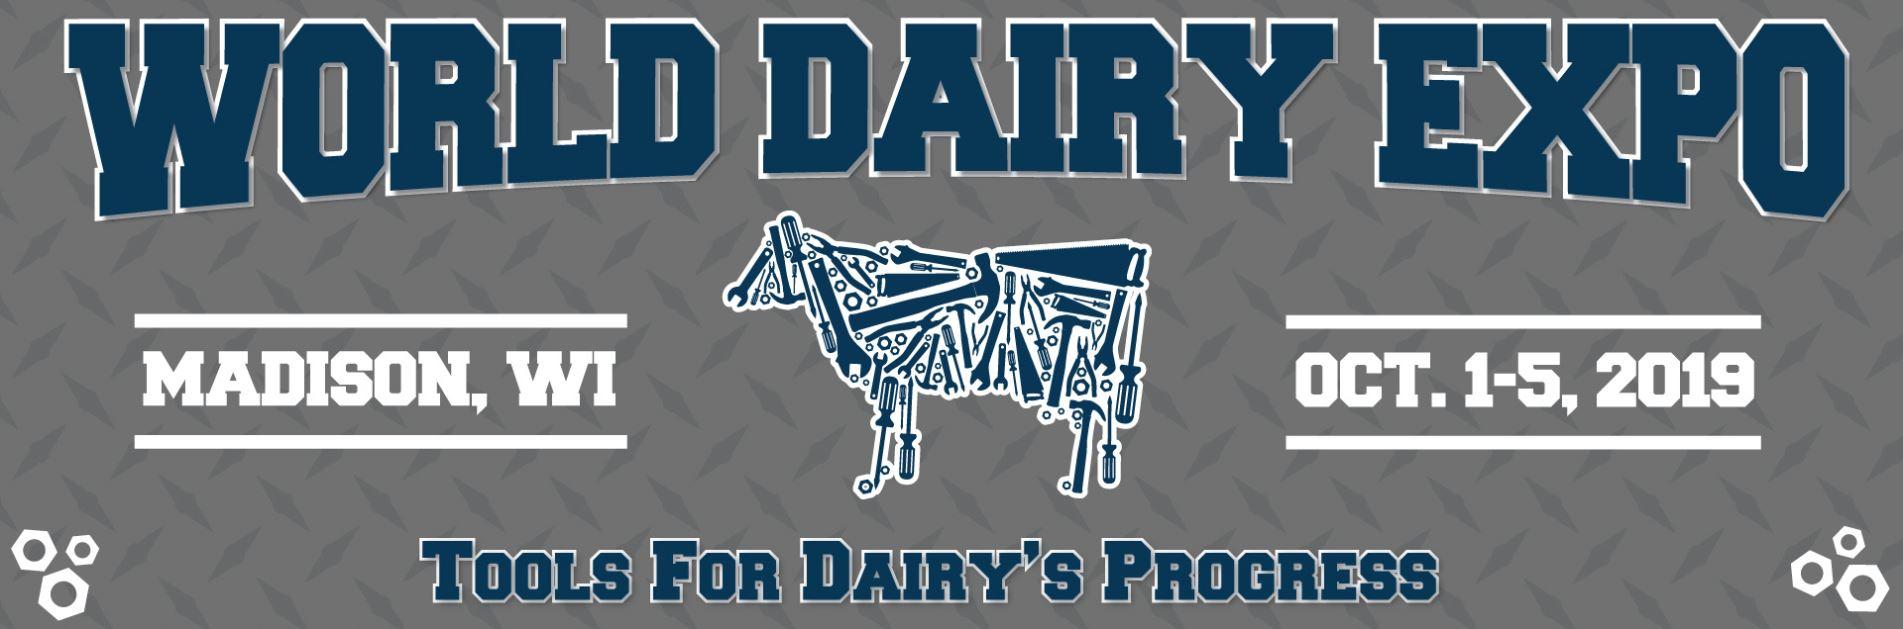 world dairy expo 2019